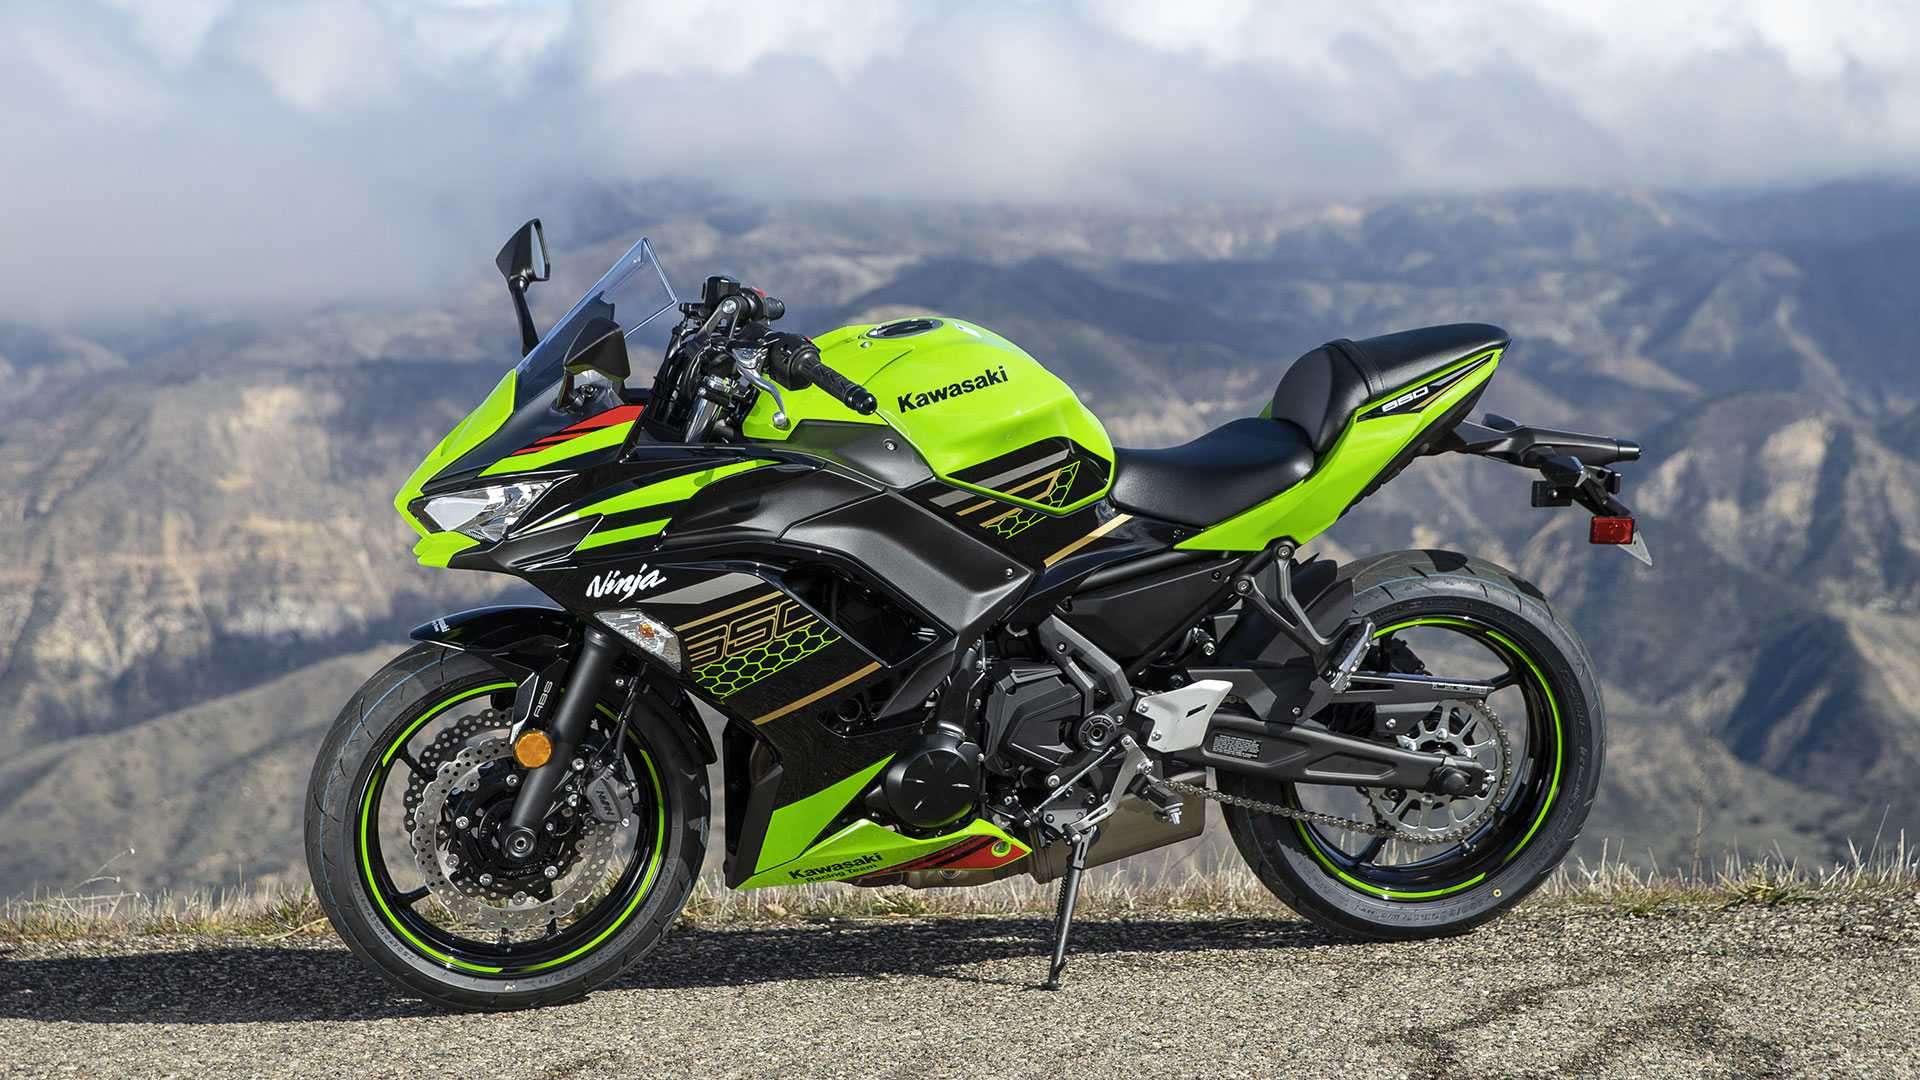 Tampak Samping Kawasaki Ninja 650 ABS KRT Edition 2020